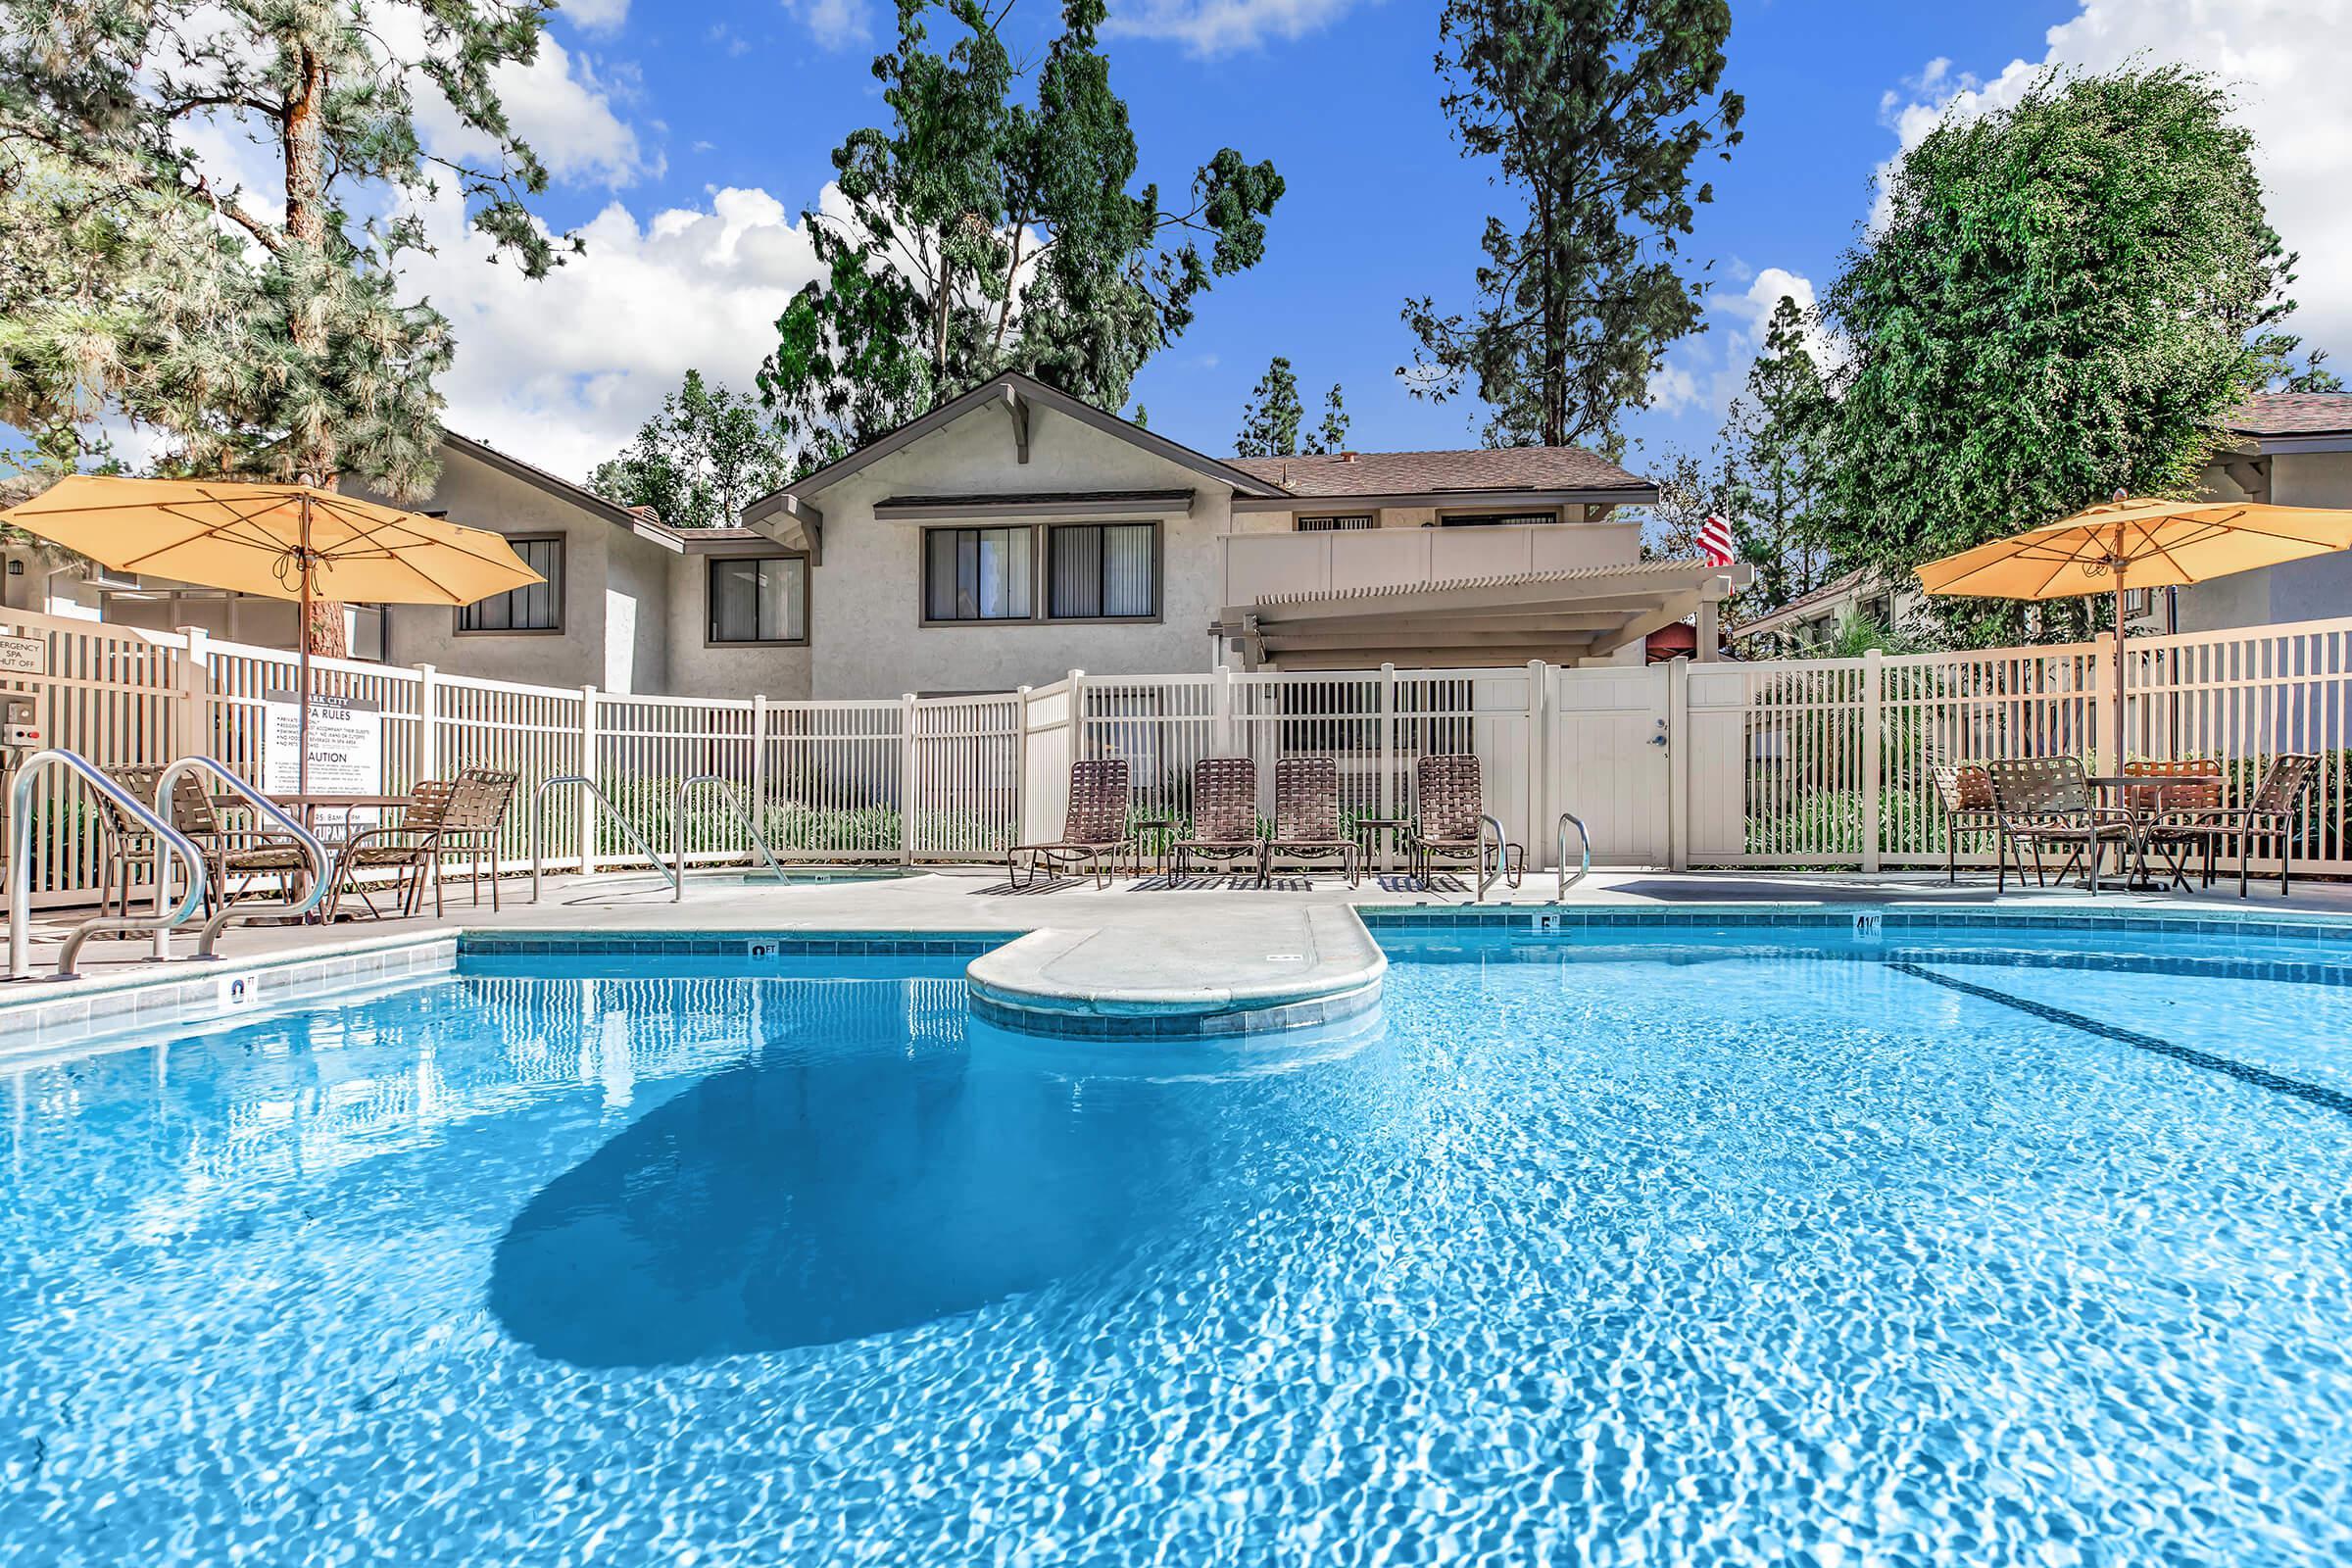 Park City Apartment Homes community pool